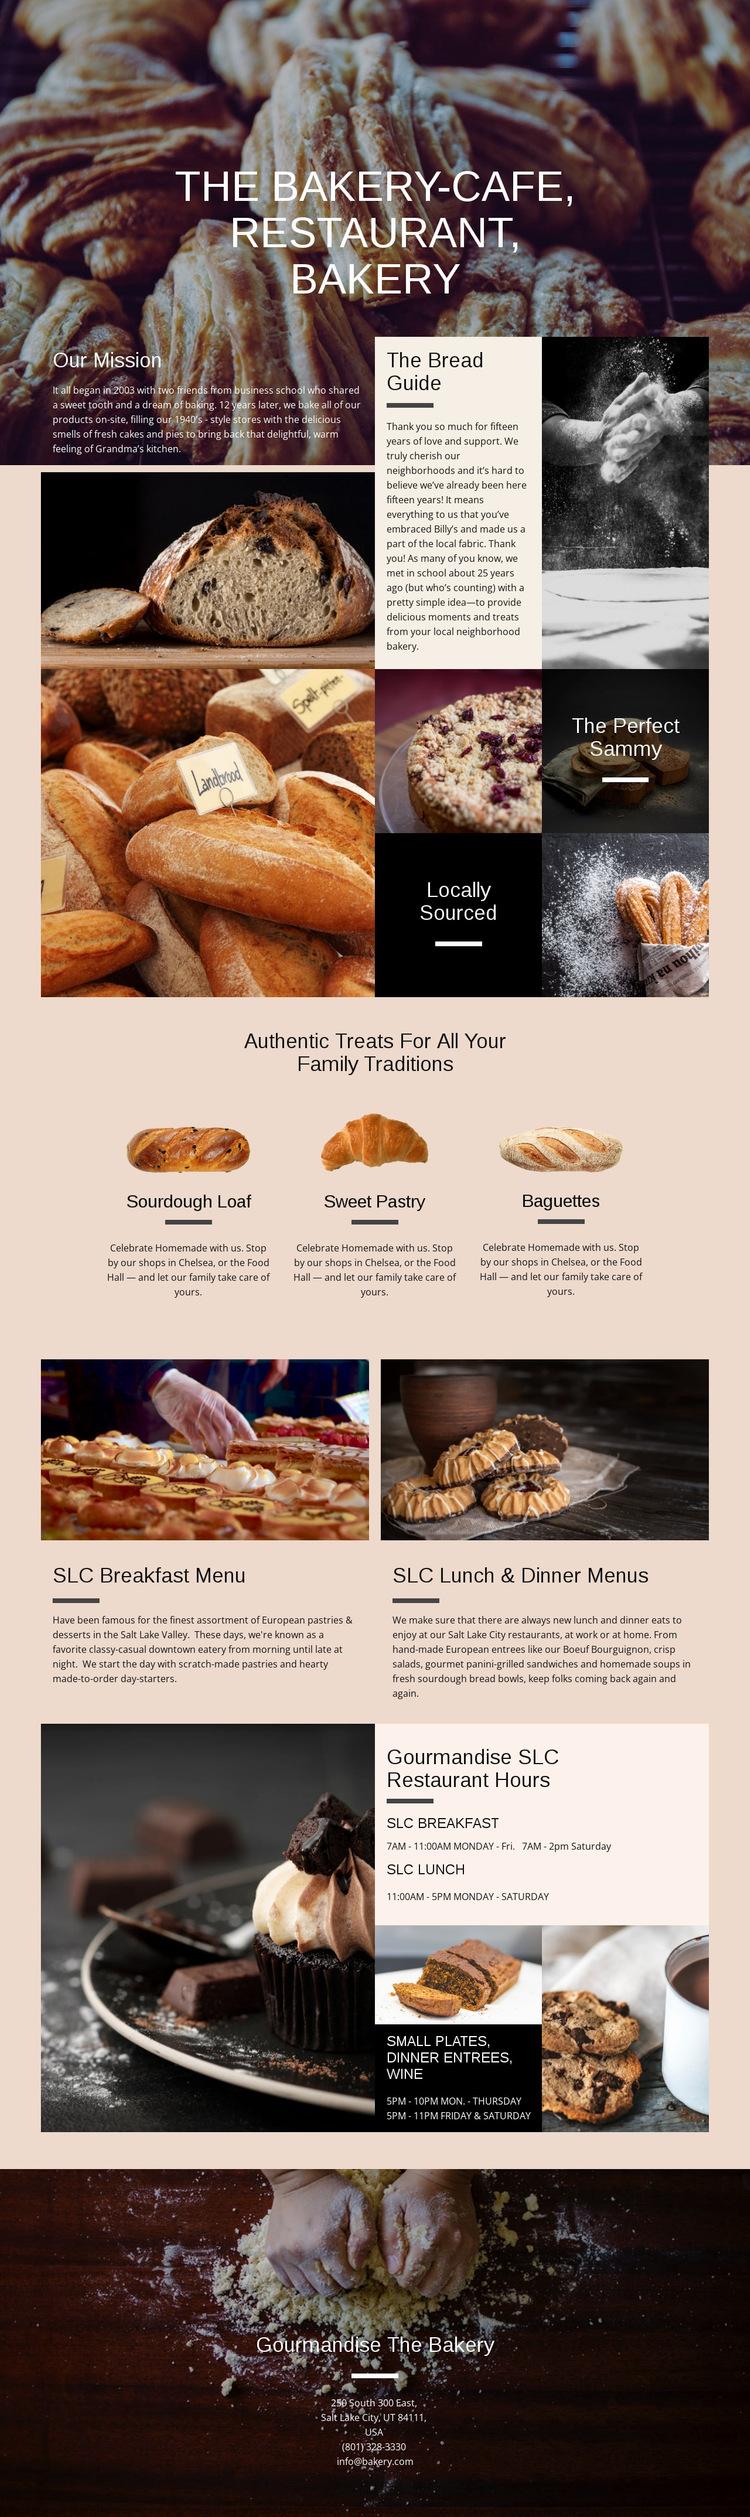 The Bakery Website Builder Templates